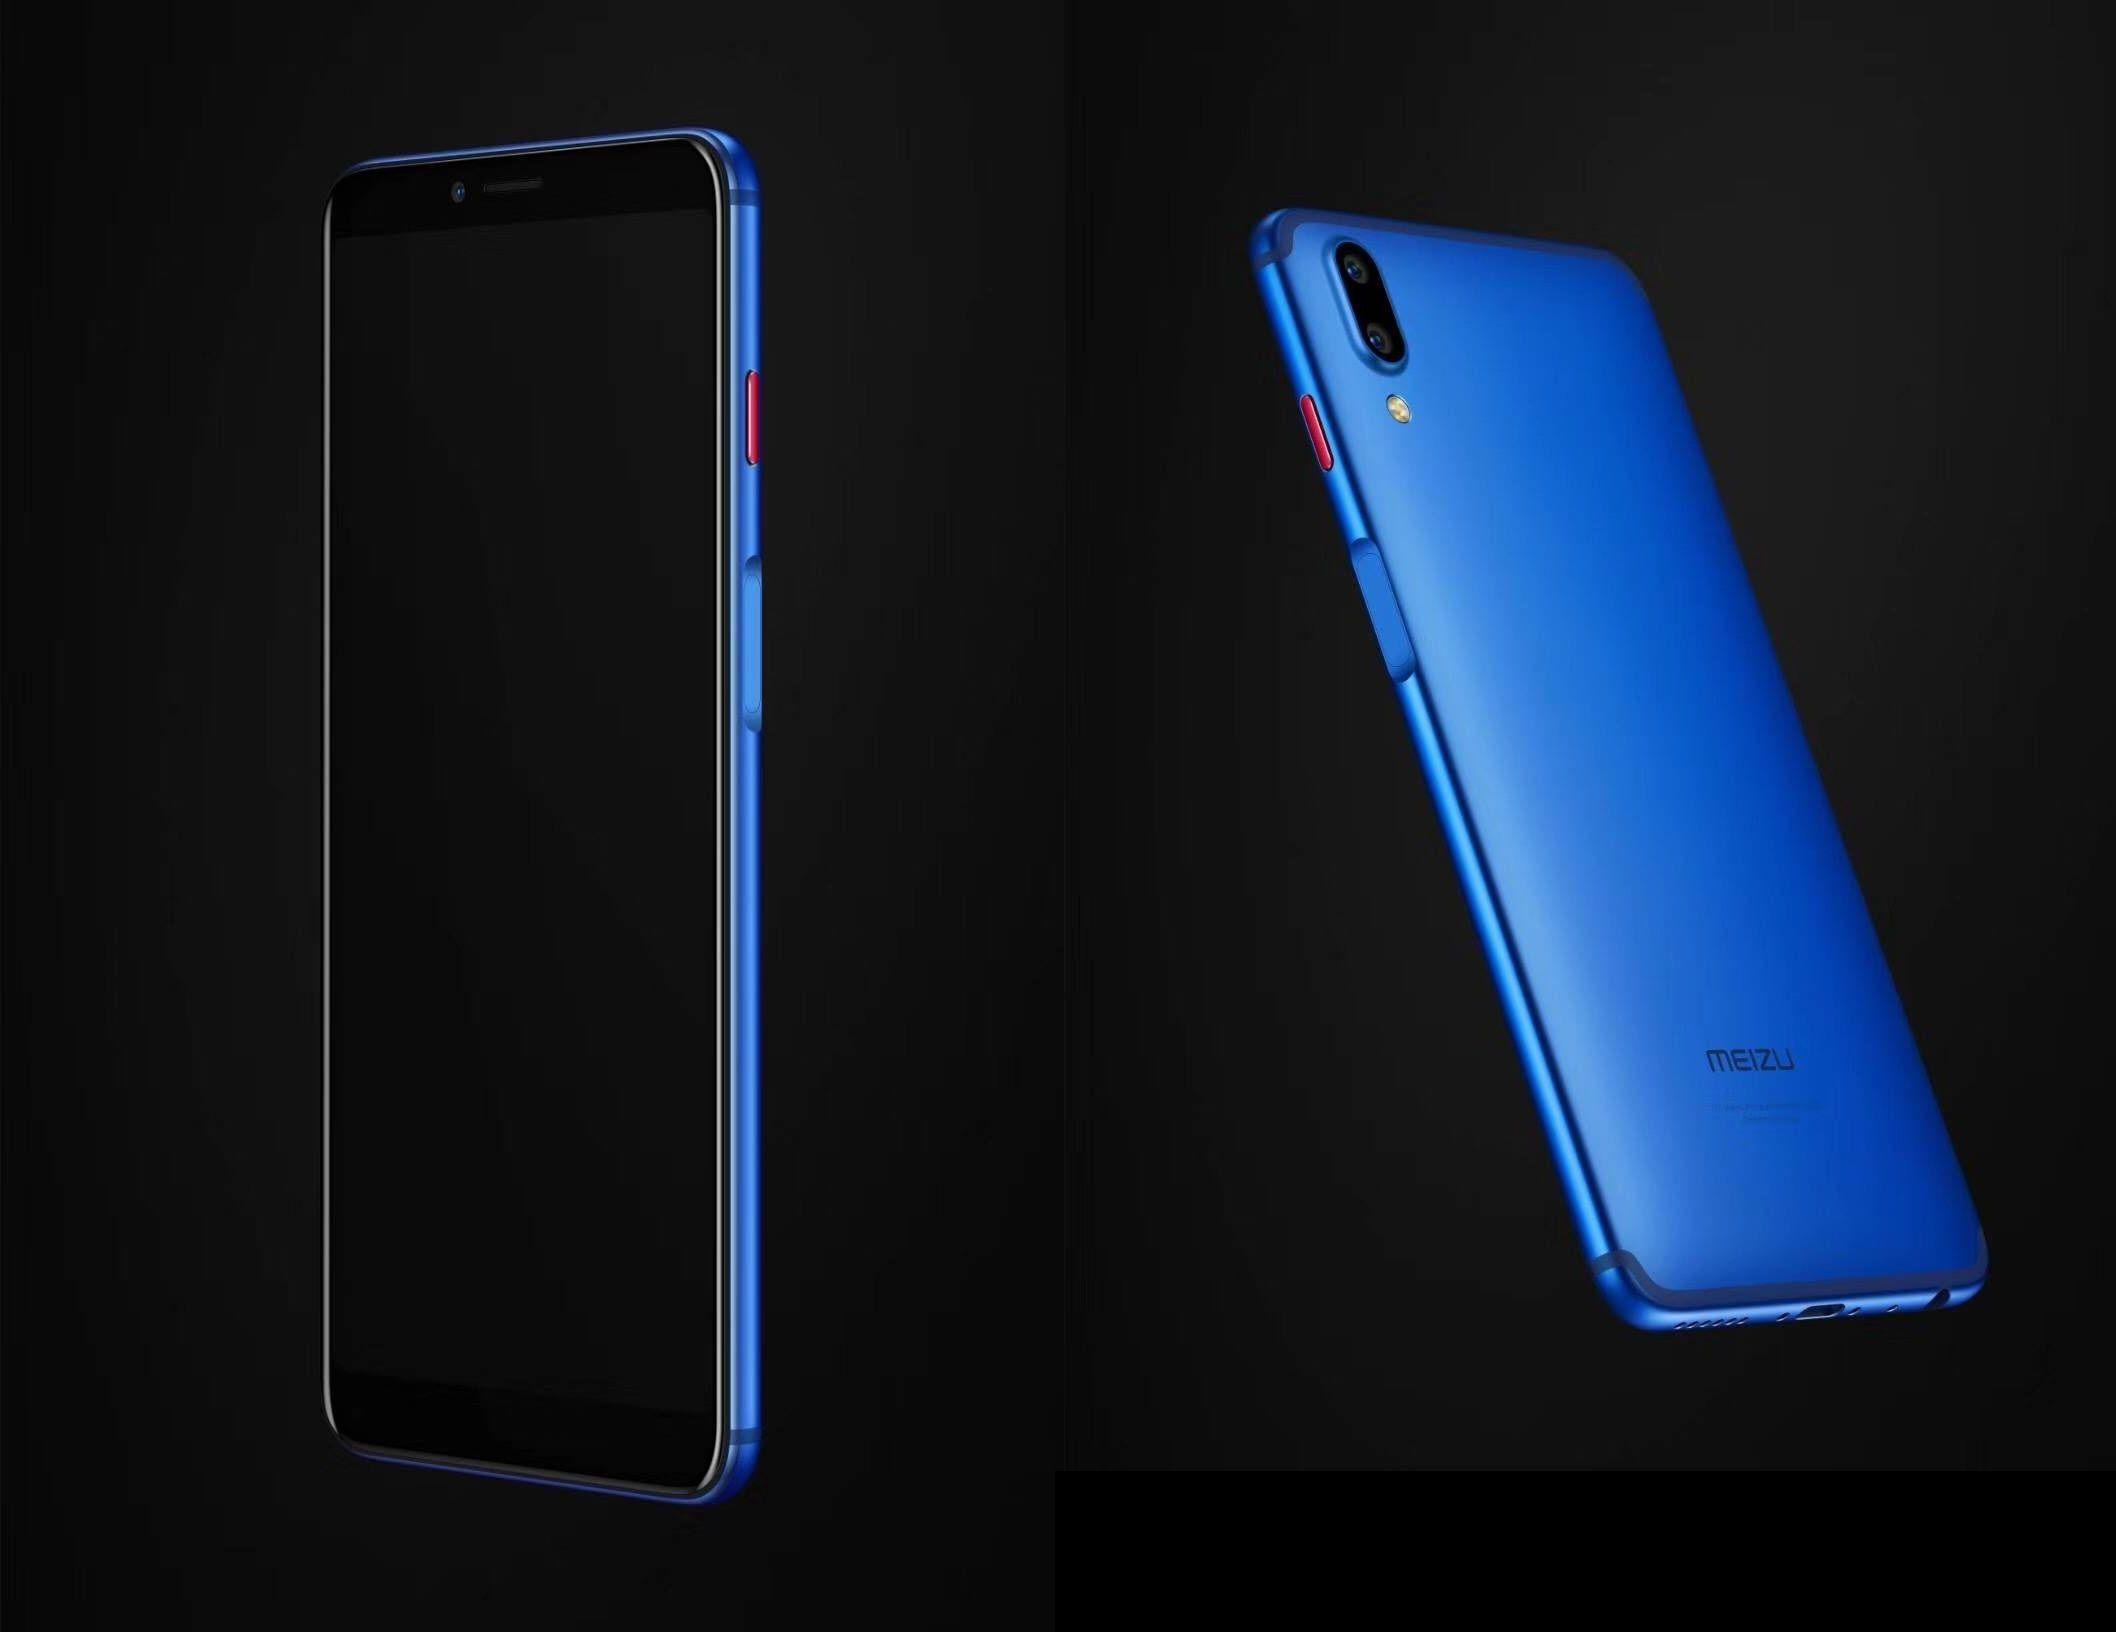 AnTuTuが魅藍E3(Meizu E3)のスペックをリーク。Qualcomm Snapdragon 636を搭載